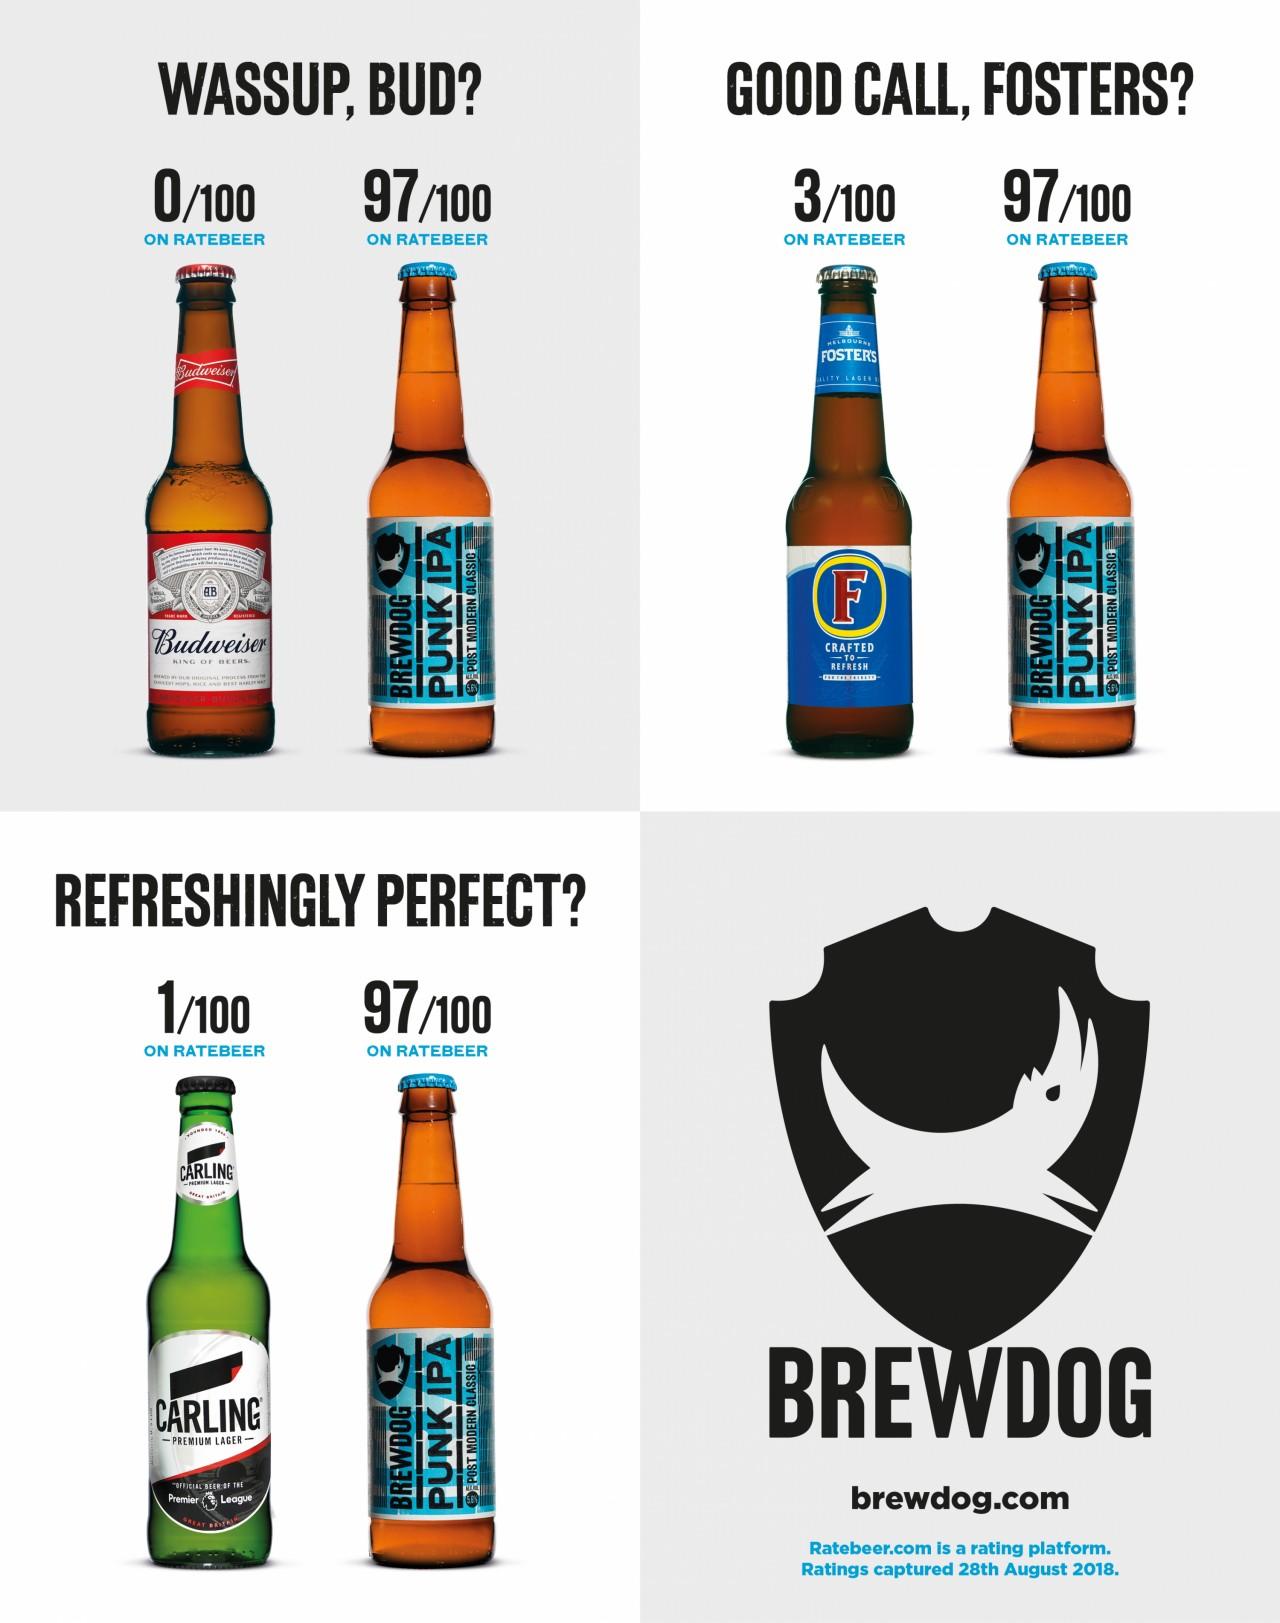 brewdog - photo #9